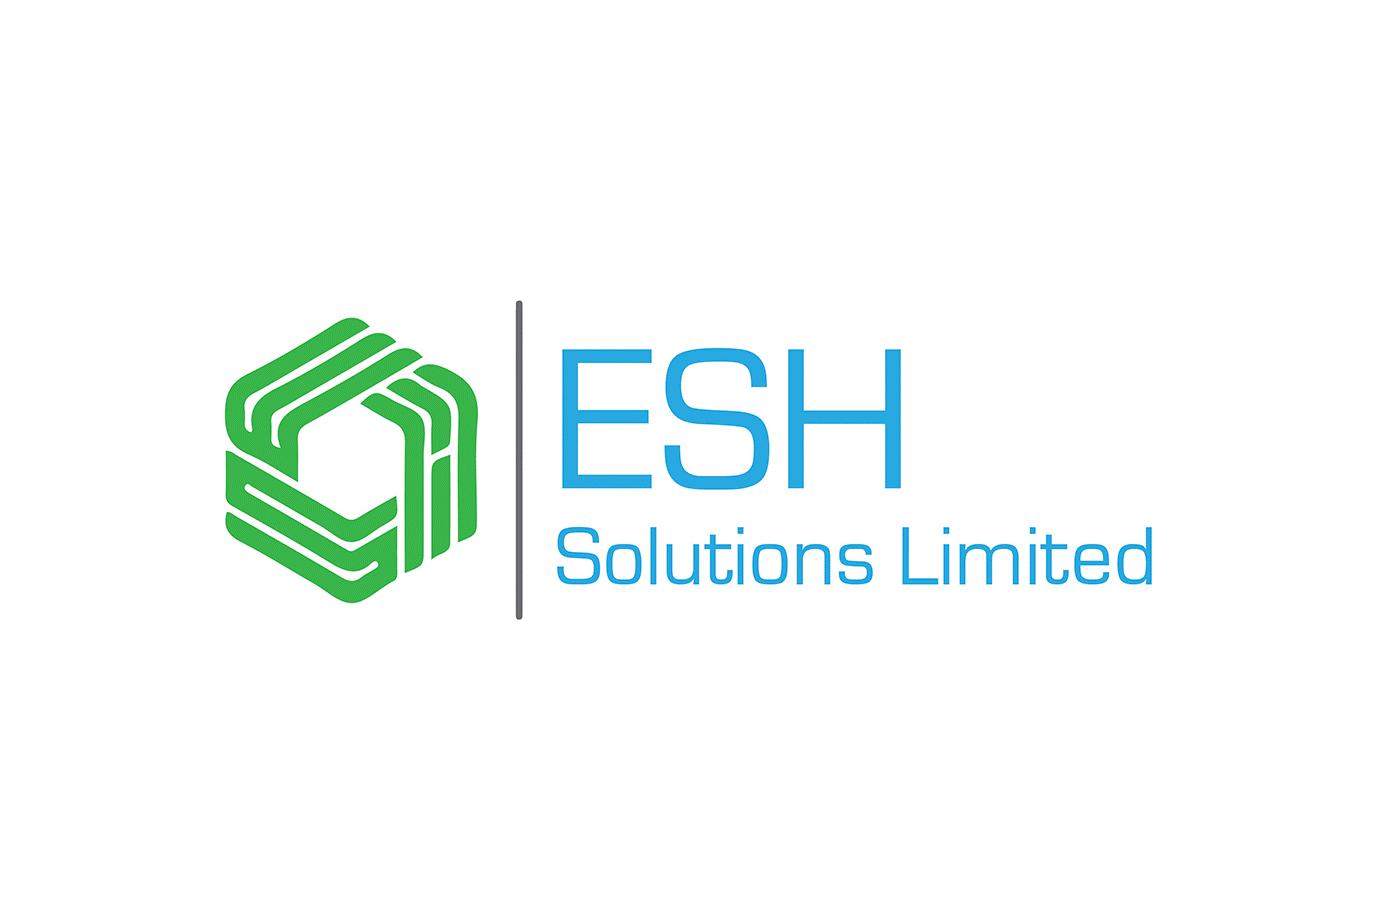 Esh Solution Limited